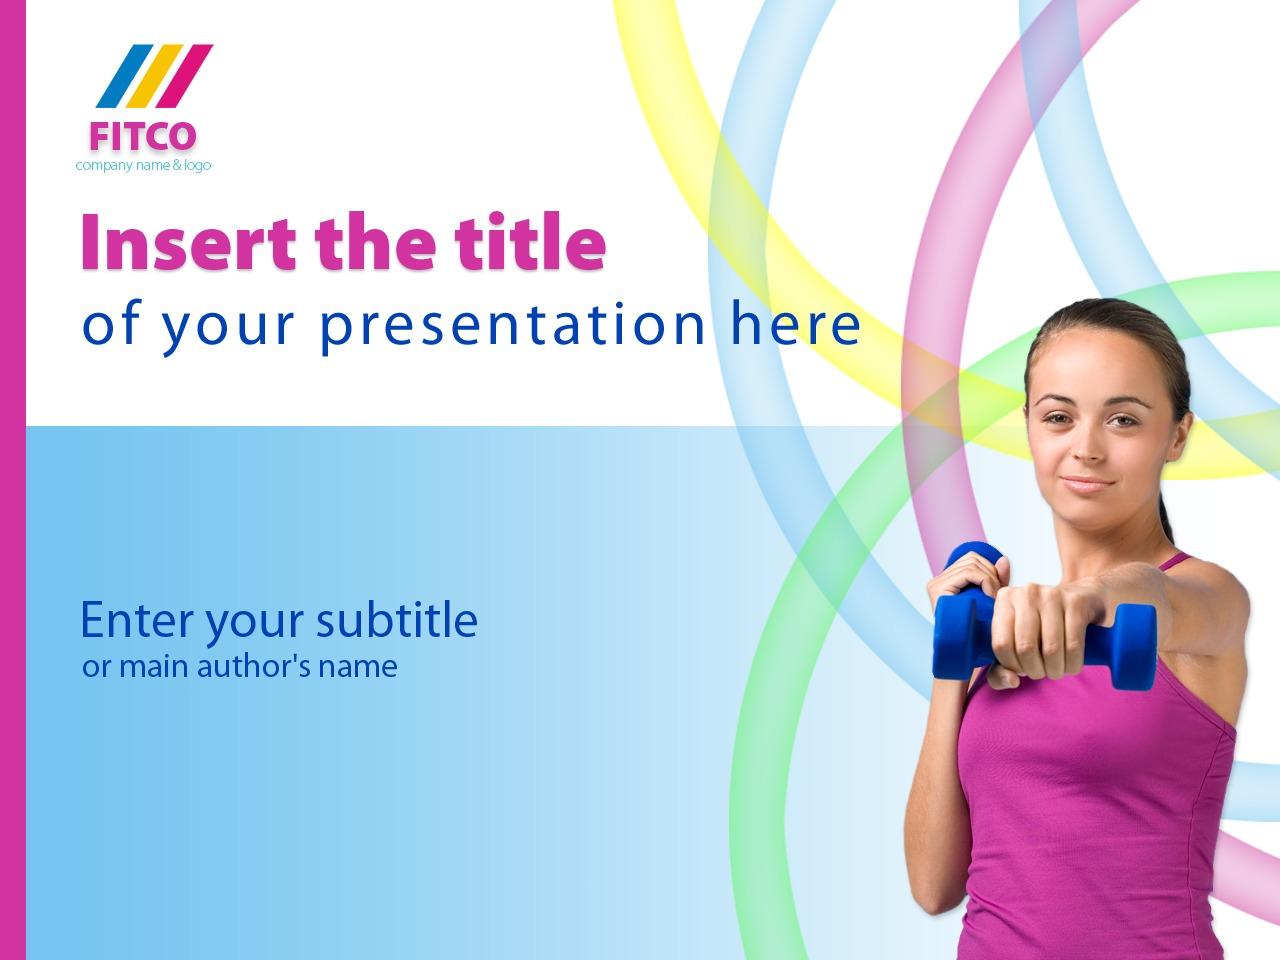 Plantilla PowerPoint #25013 para Sitio de Fitness